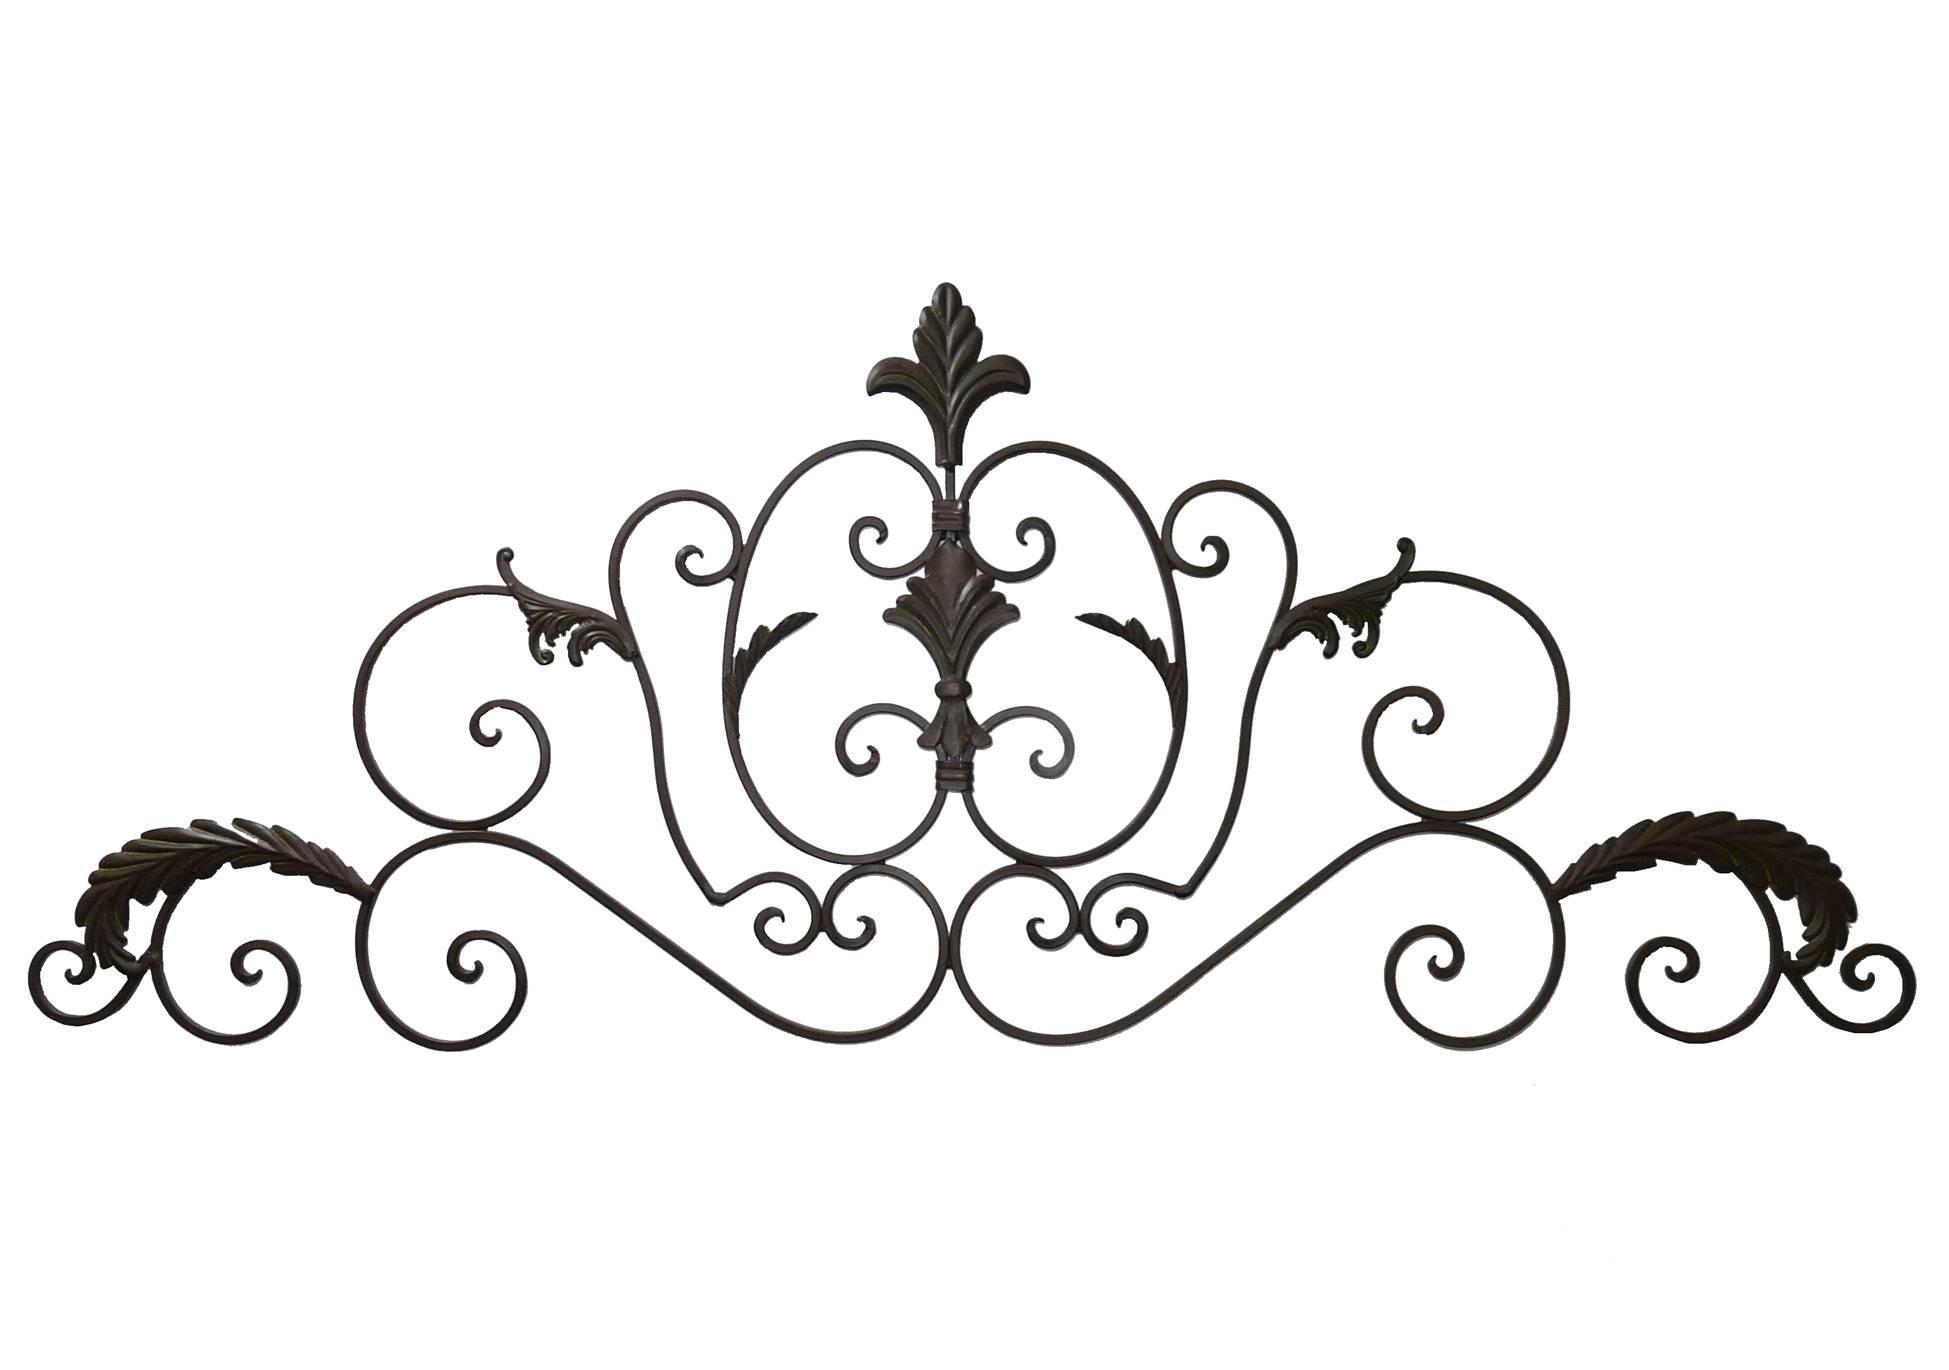 Applique décorative style baroque fronton mural ou dessus de porte